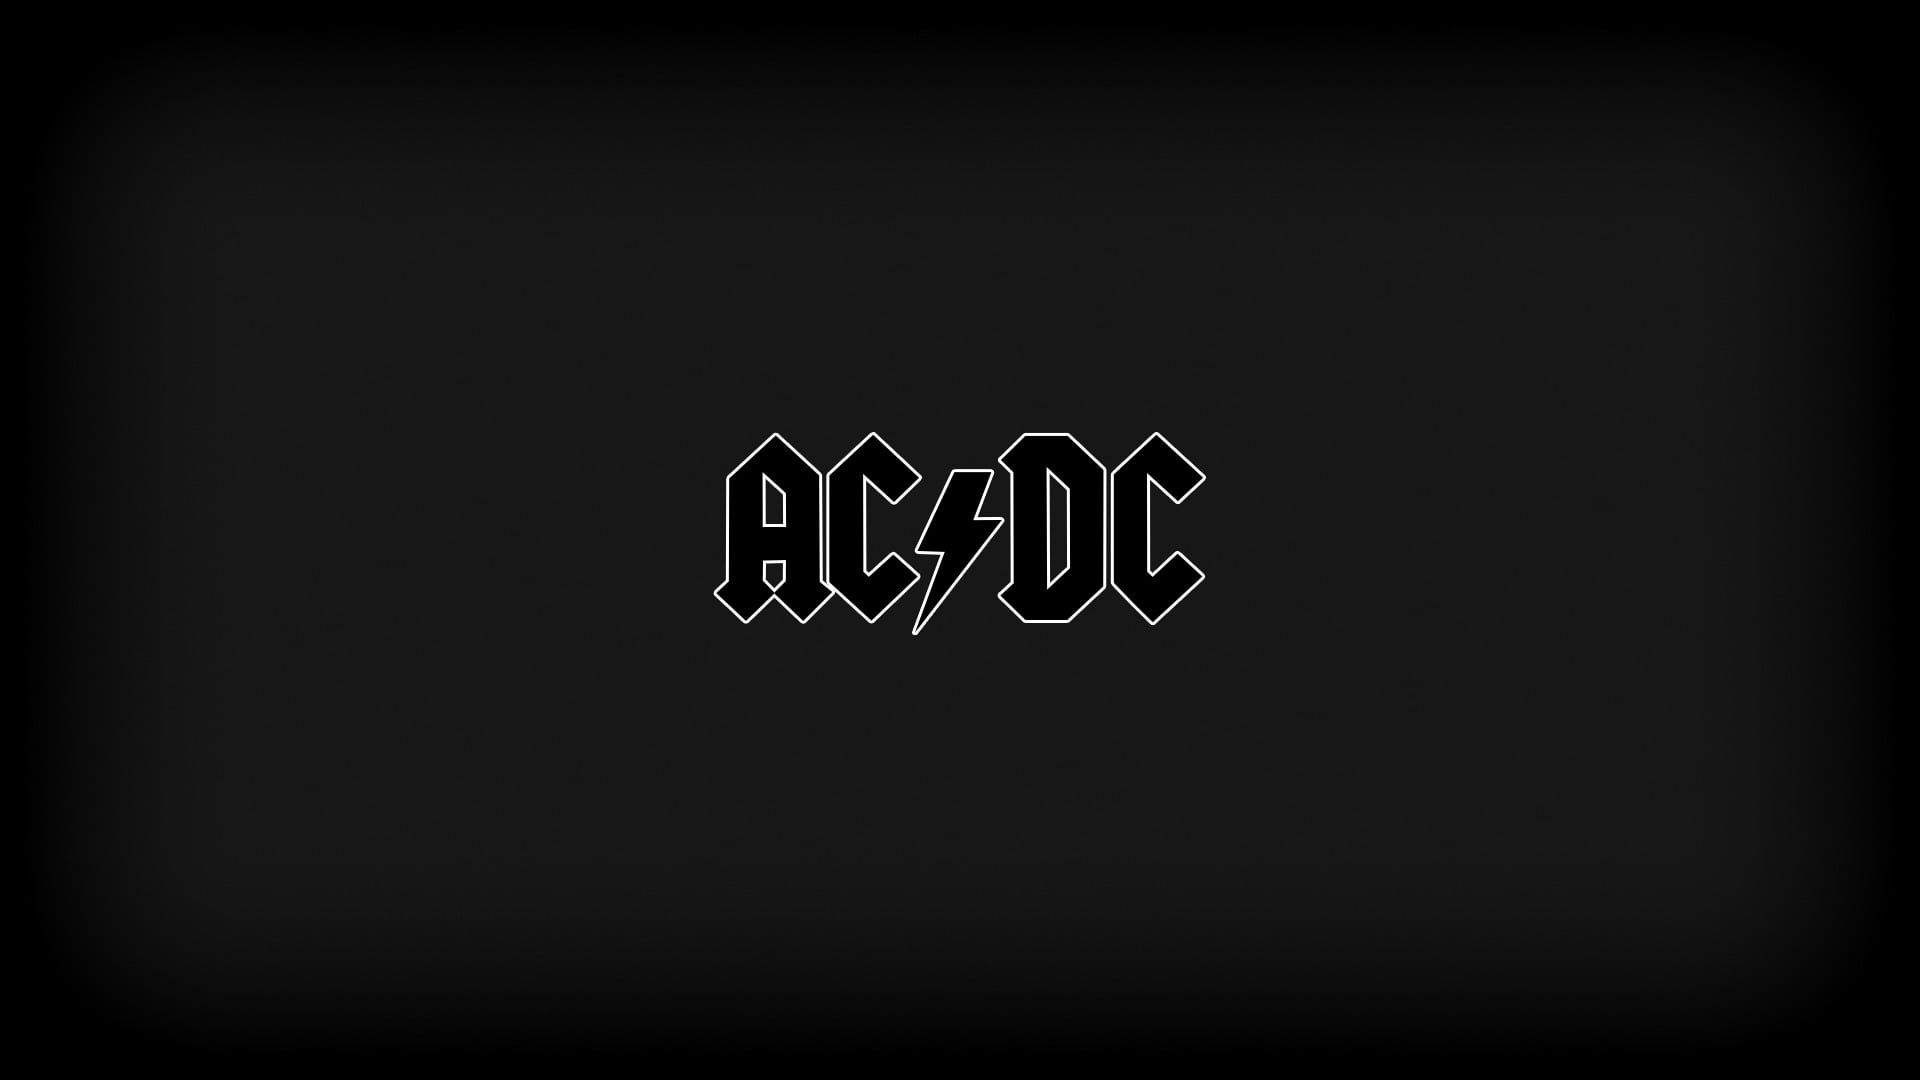 Ac Dc Logo On Black Background Acdc Ac Dc Rock 1080p Wallpaper Hdwallpaper Desktop Acdc Logo Black Wallpaper Acdc